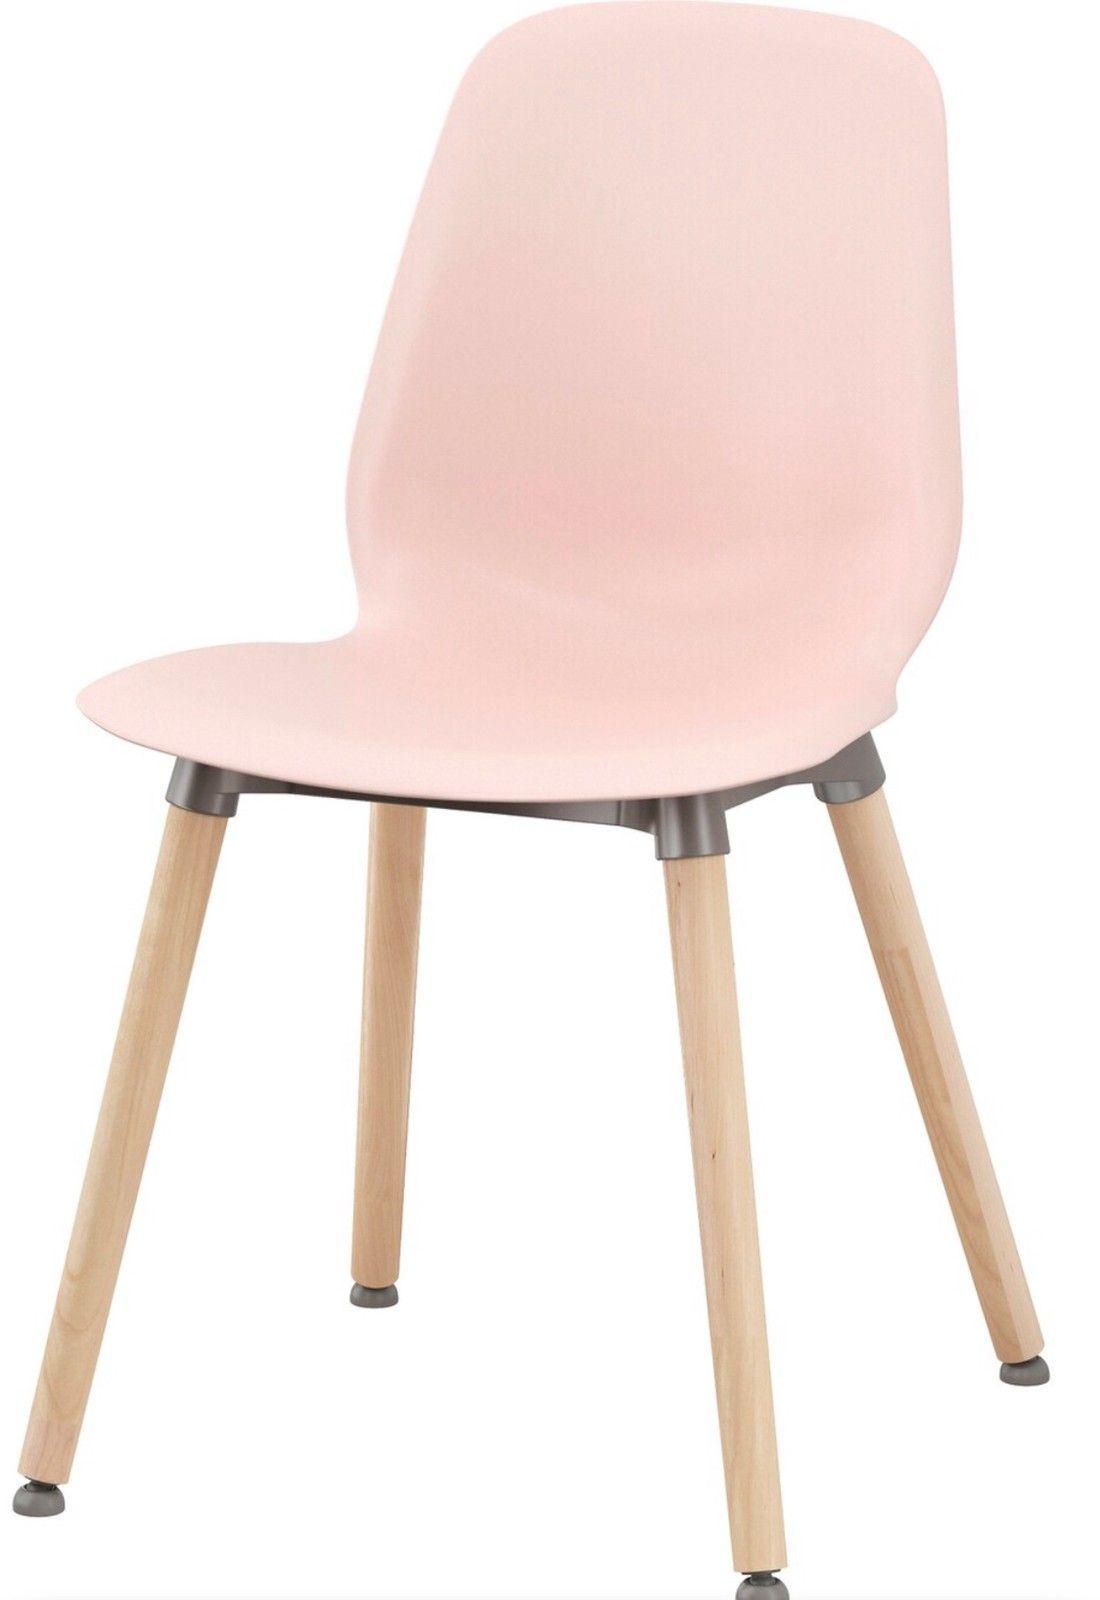 Rosa Ikea stol med oppbevaring | FINN.no